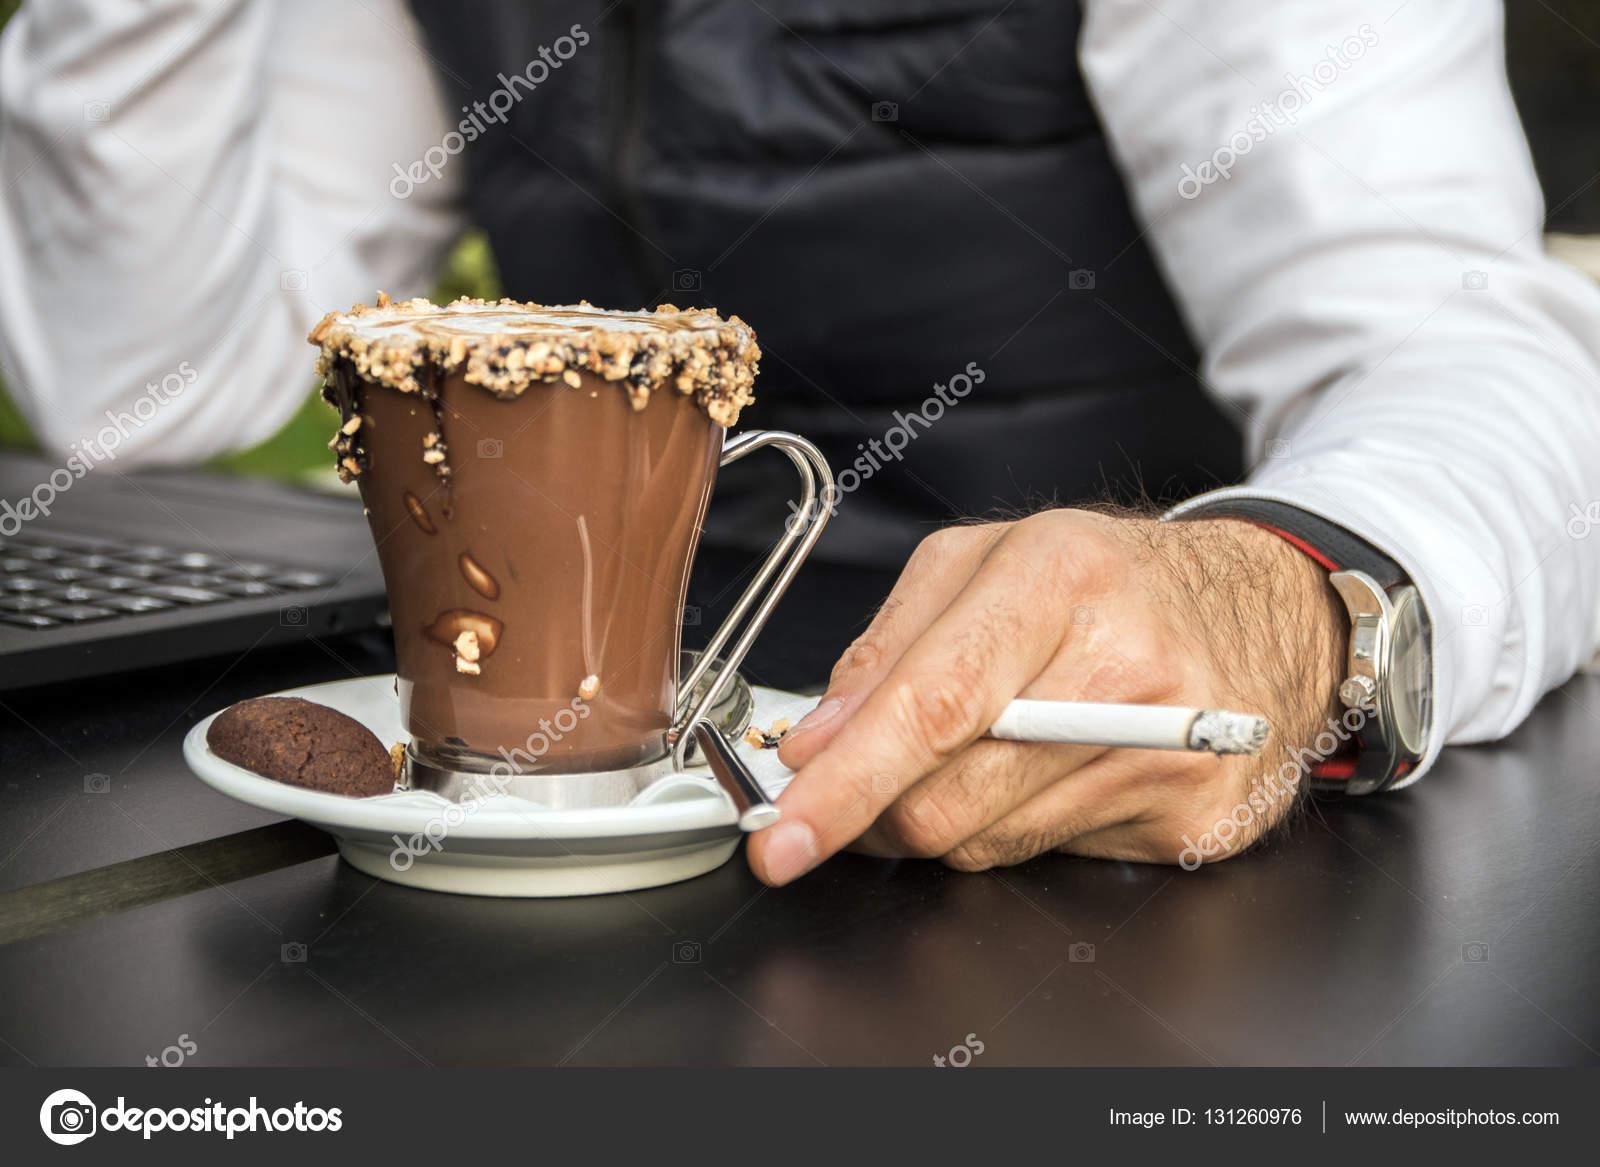 "Expresa tu momento "" in situ "" con una imagen - Página 33 Depositphotos_131260976-stock-photo-man-holding-a-cigarette-in"